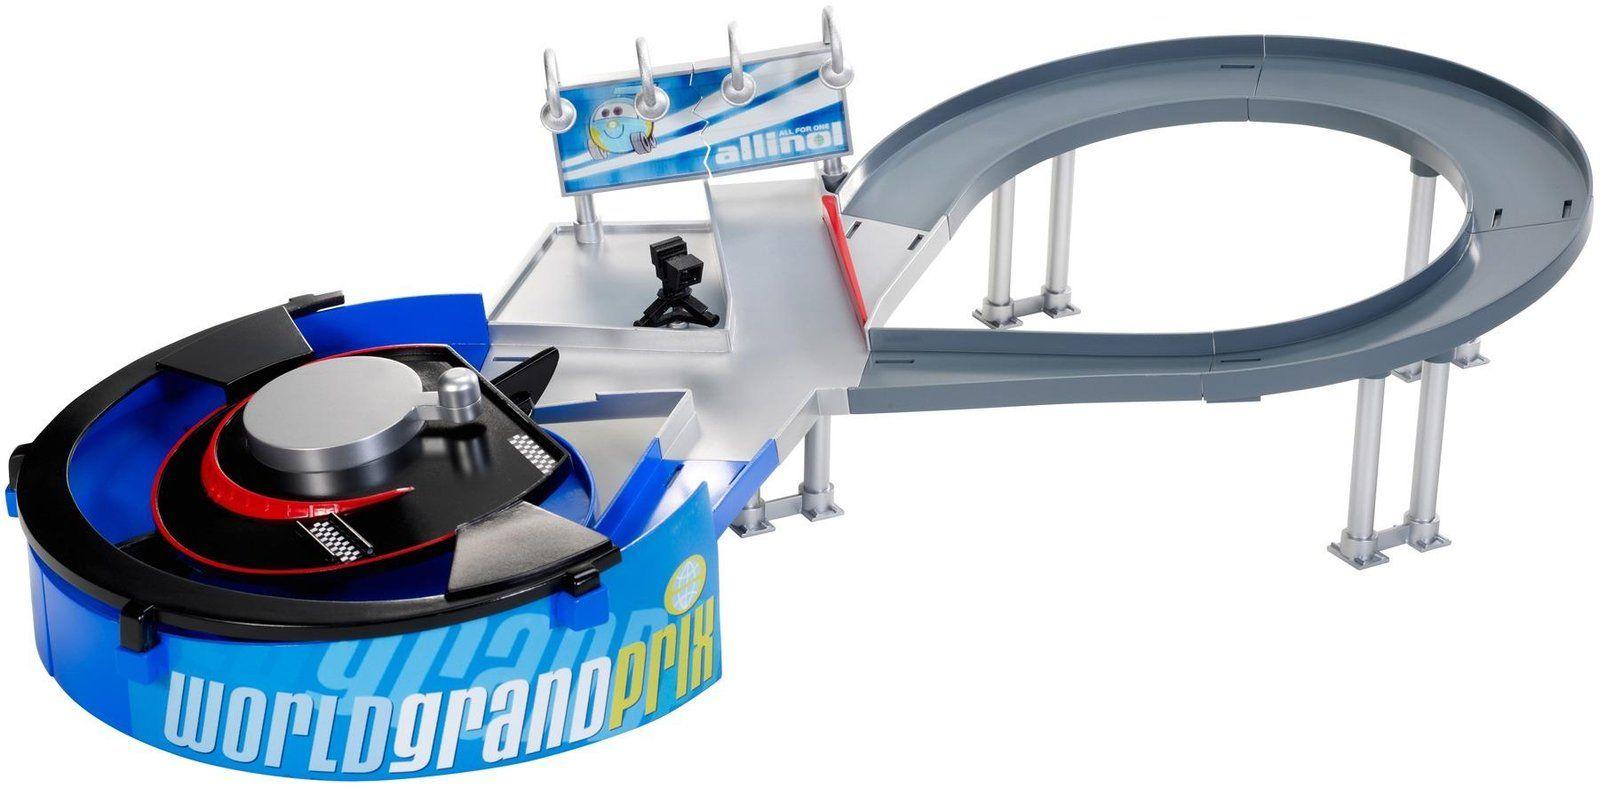 Cars 2 Quick Changers Crash \'N\' Change Speedway Track Set $24.99 ...